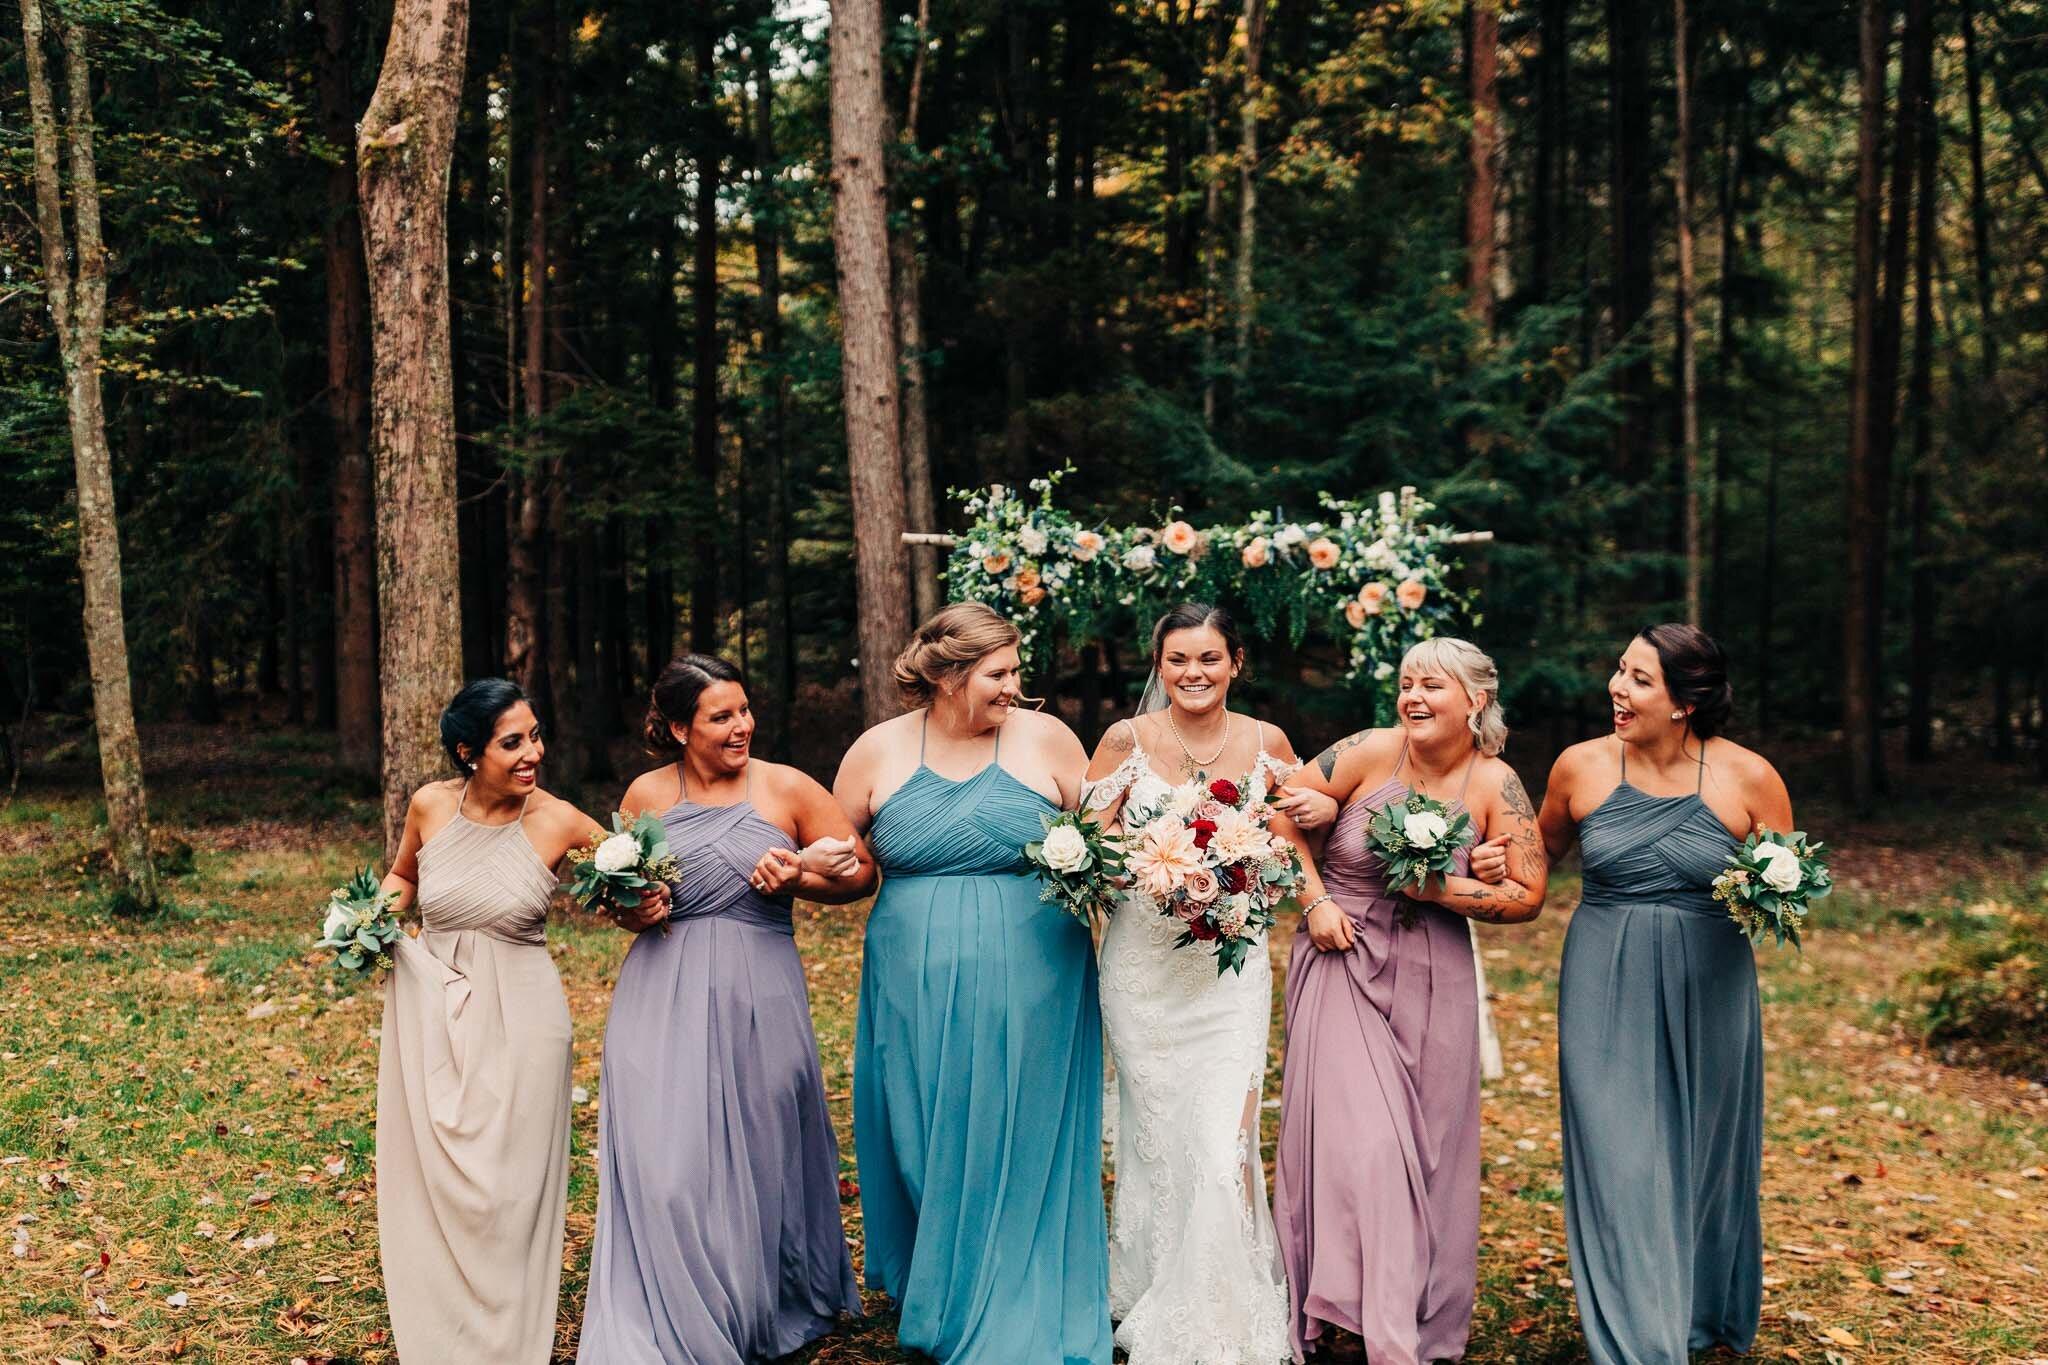 whitewoods-fall-wedding-8275.jpg